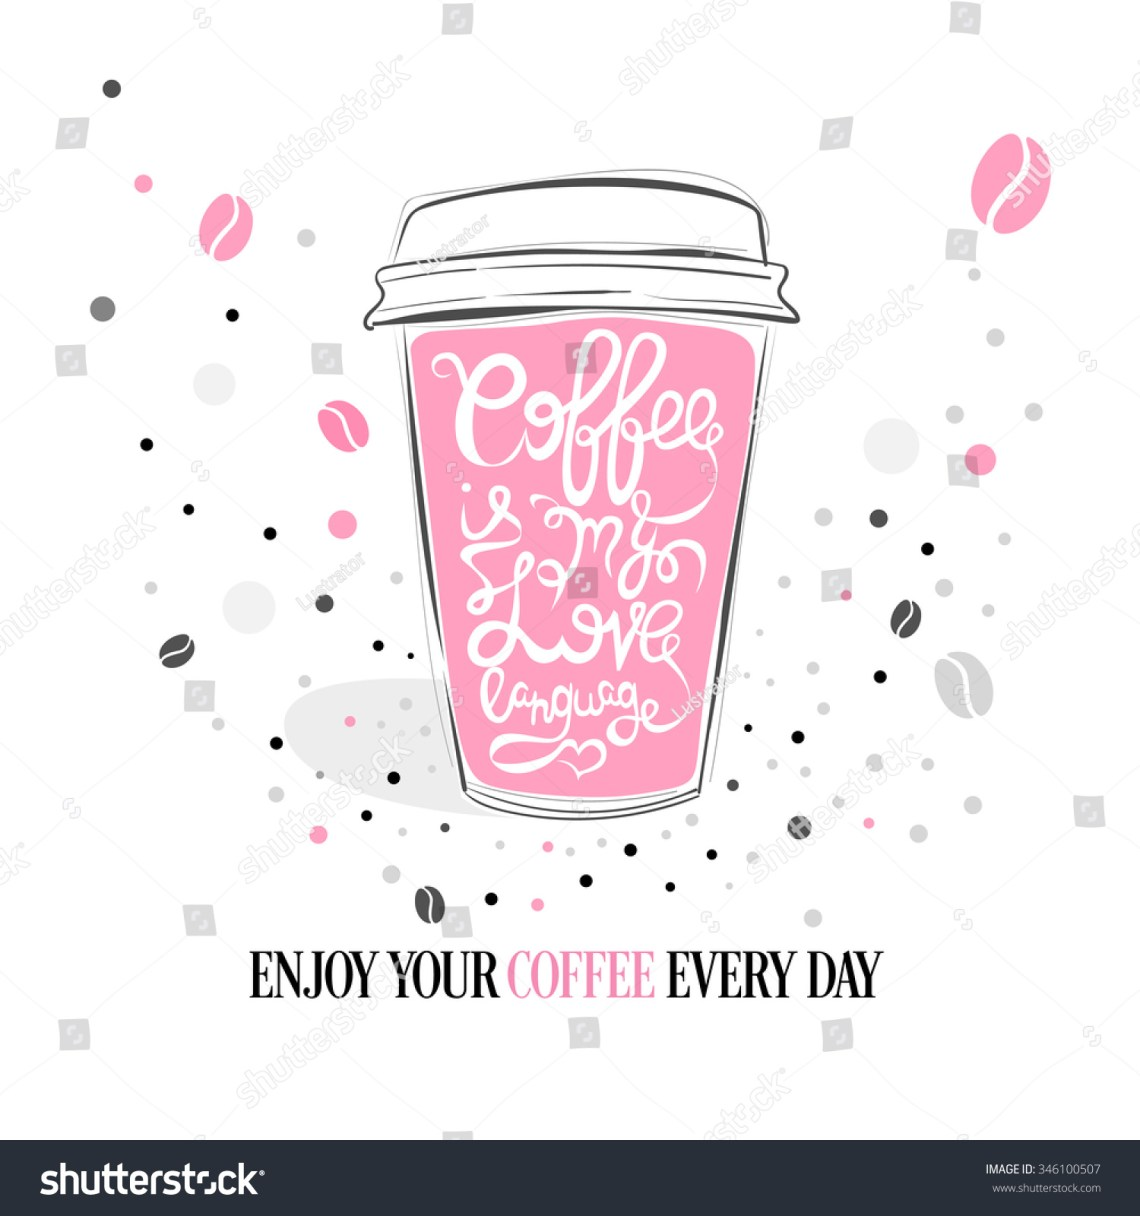 Download Coffee My Love Language Hand Drawn Stock Vector 346100507 ...